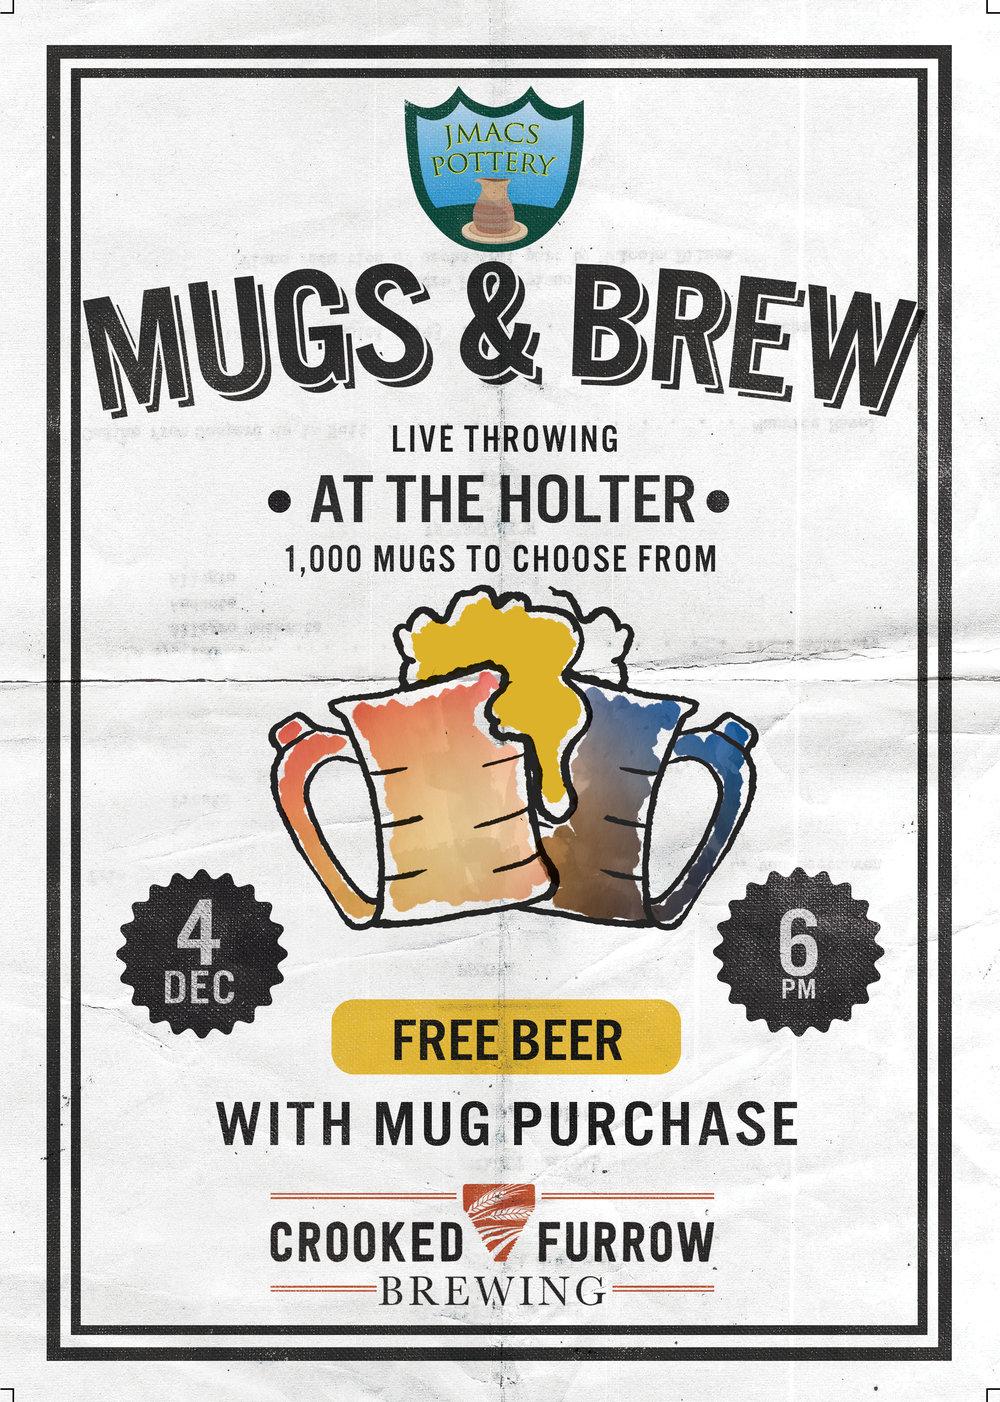 mugs-and-brew-web.jpg